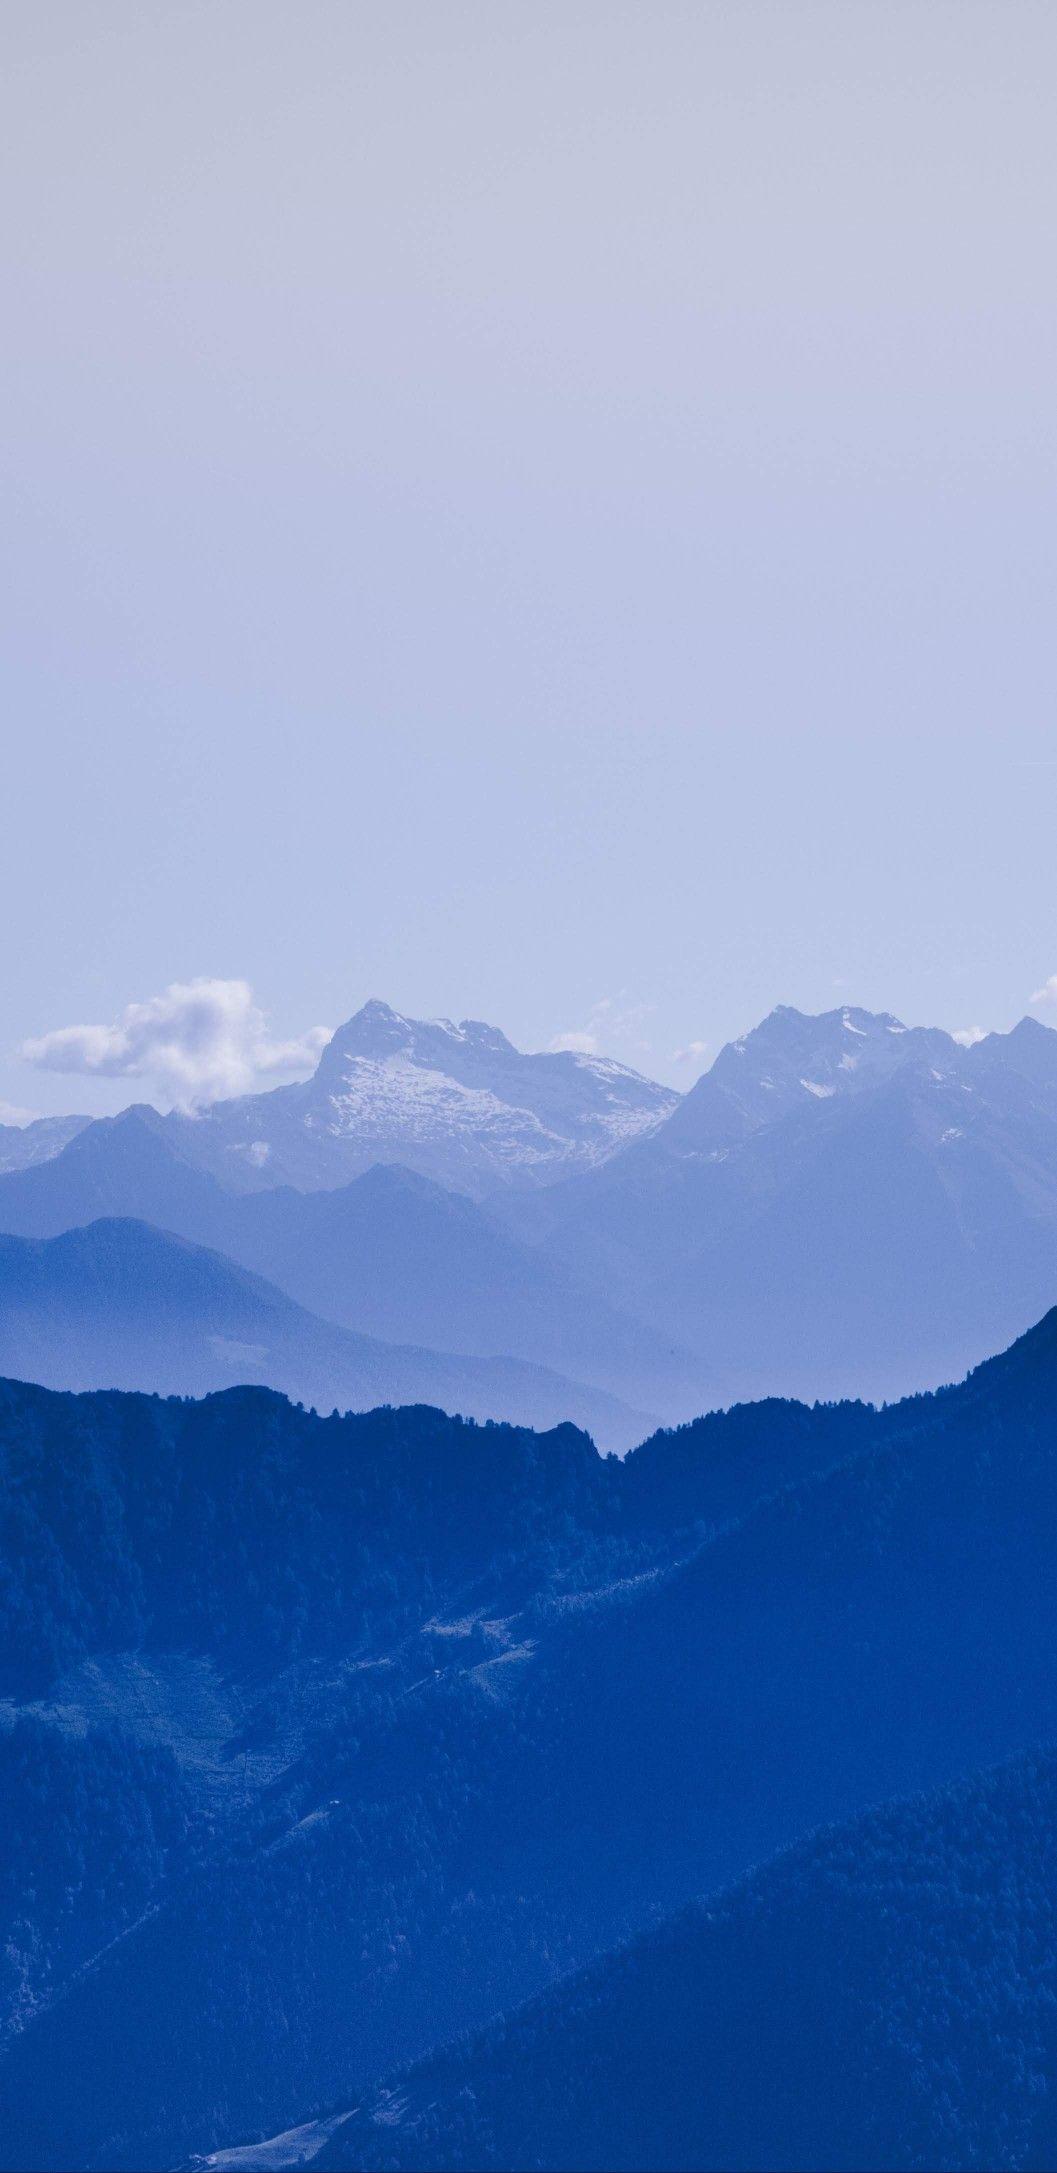 Whatsapp Background Tumblr Wallpaper Blue Skies Gradient